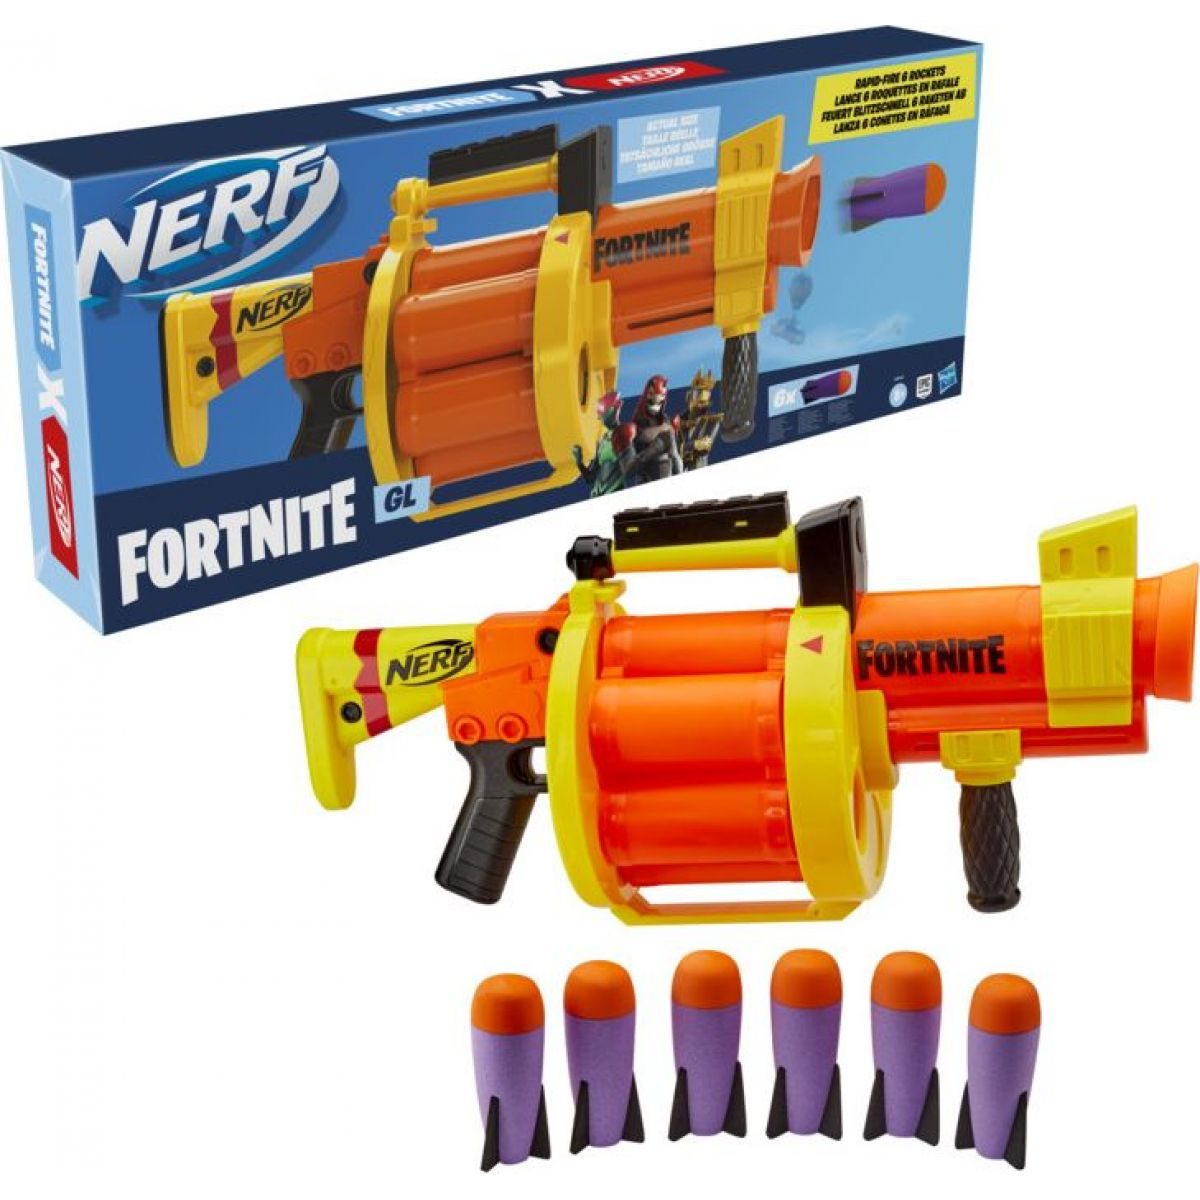 Hasbro Nerf Fortnite GL